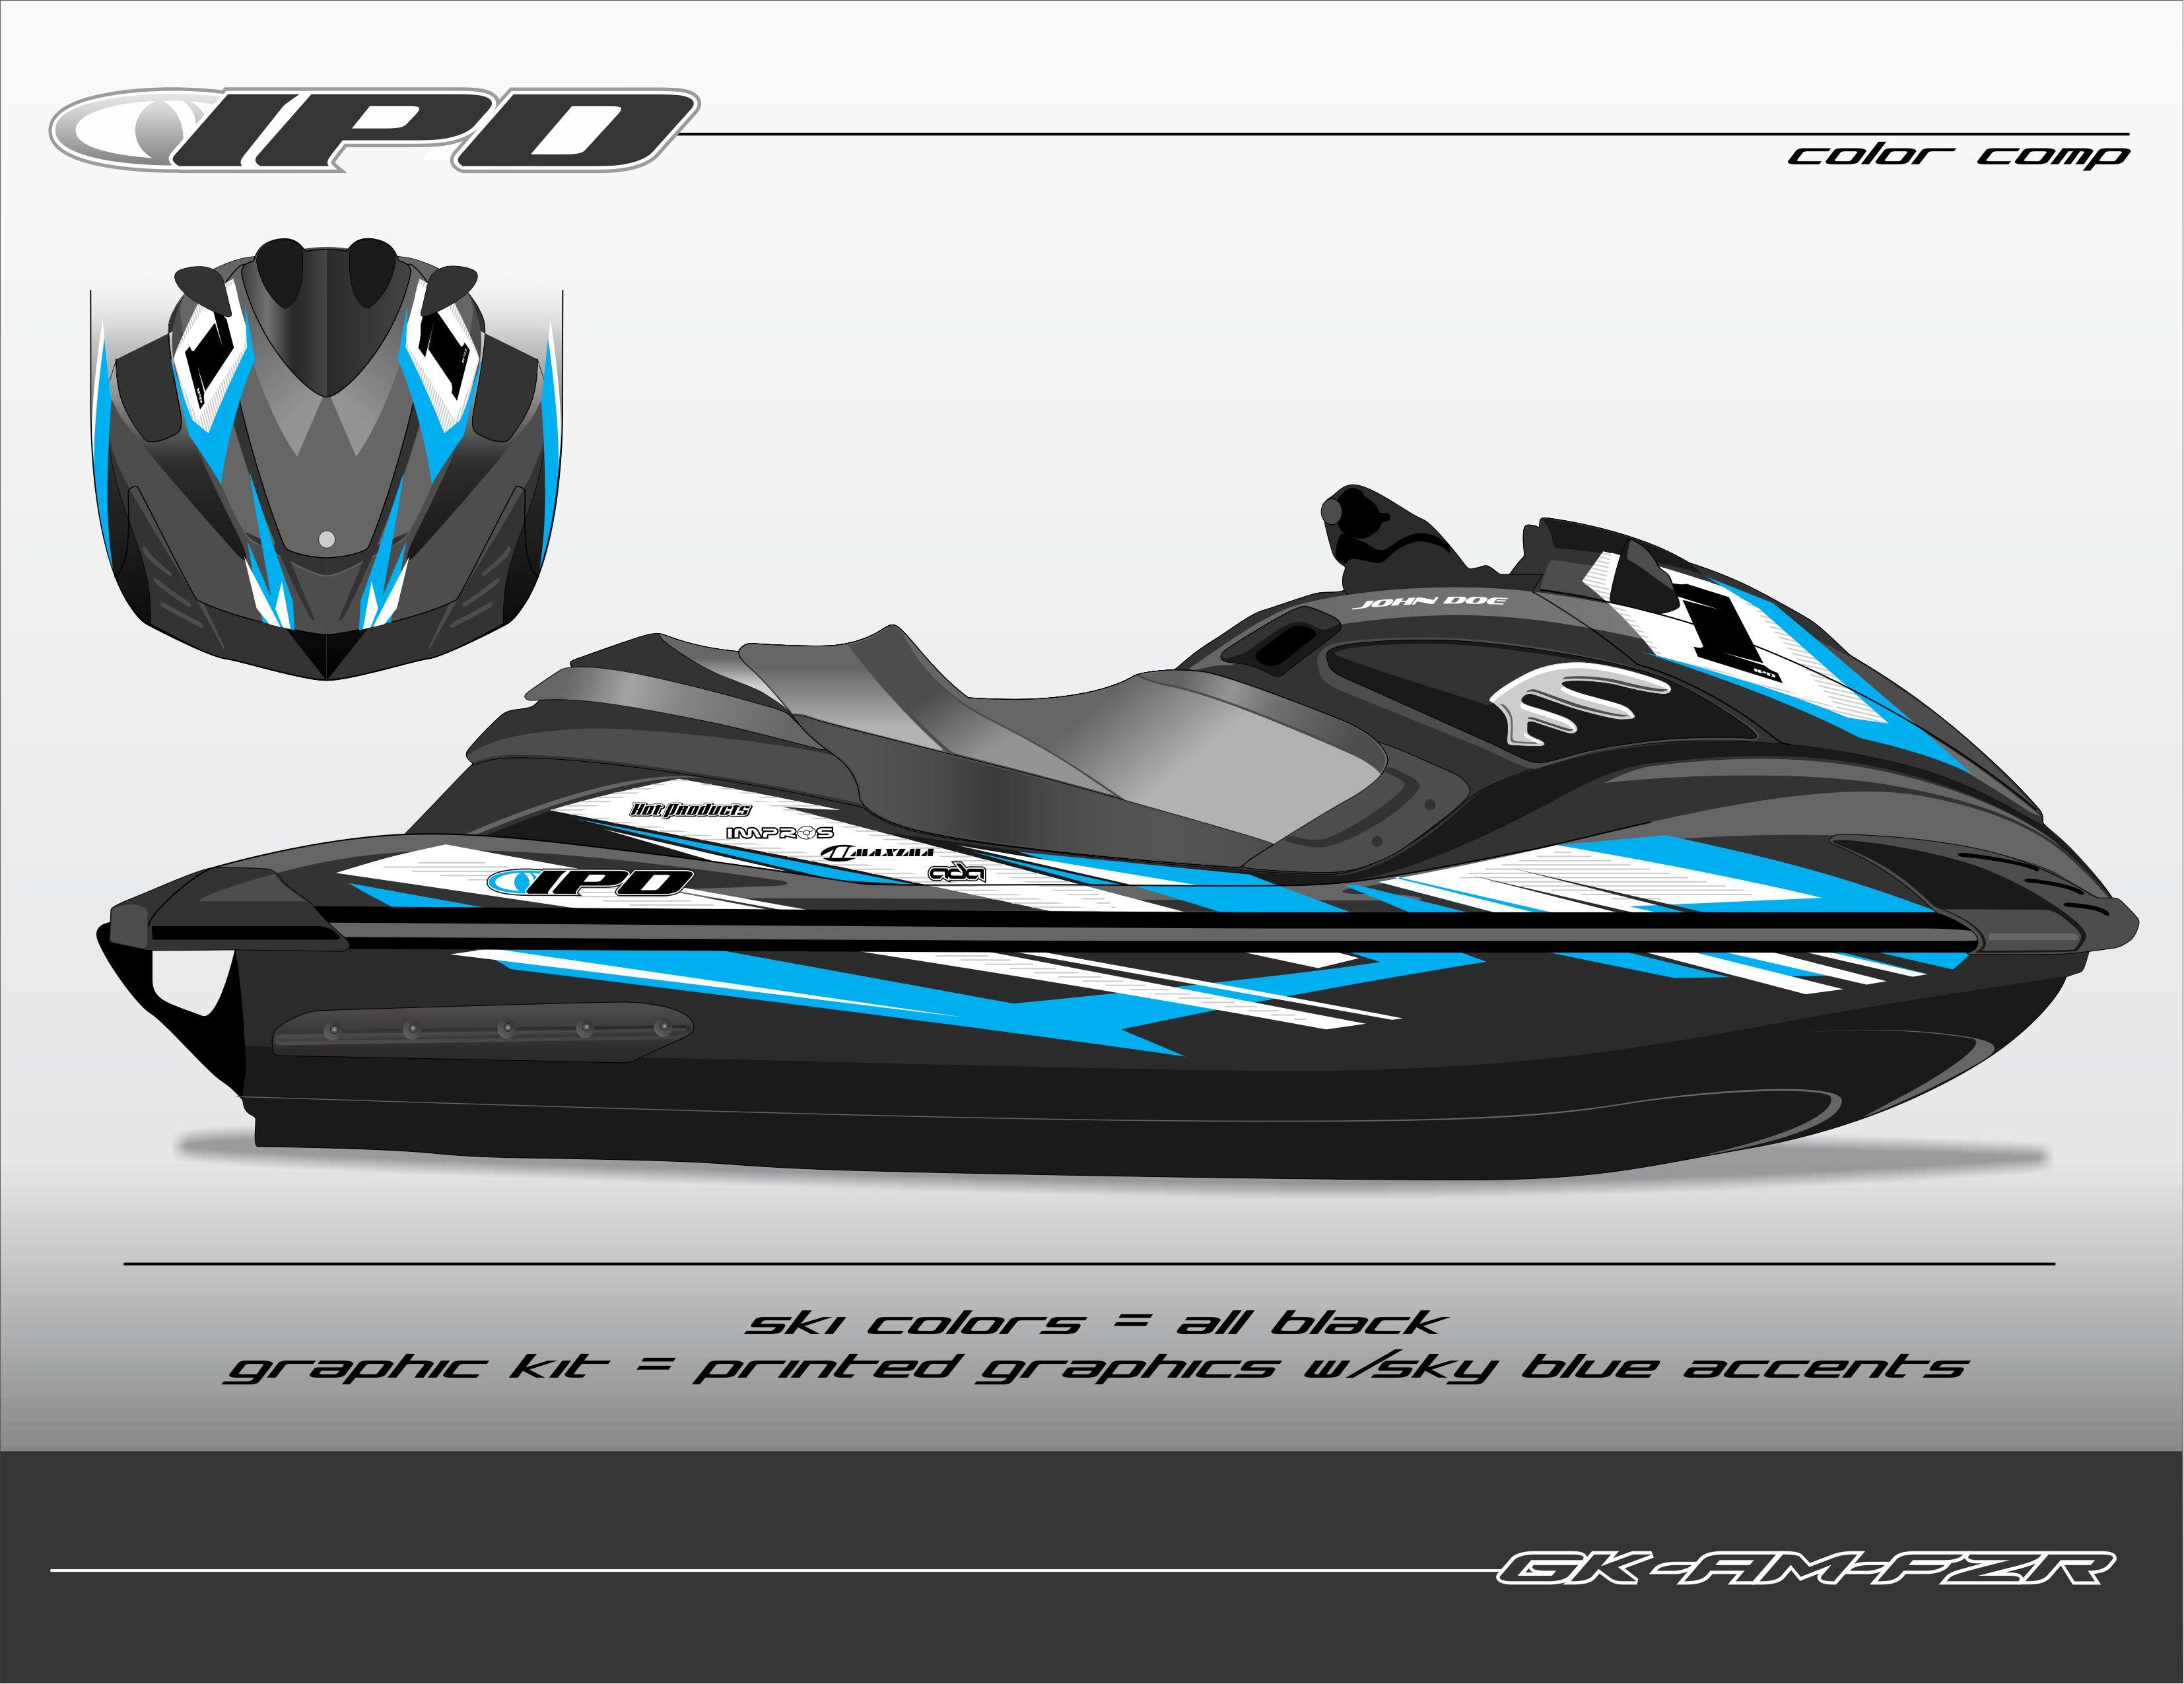 Yamaha fzs fzr graphics kit am design ipd jet ski for Yamaha jet skis